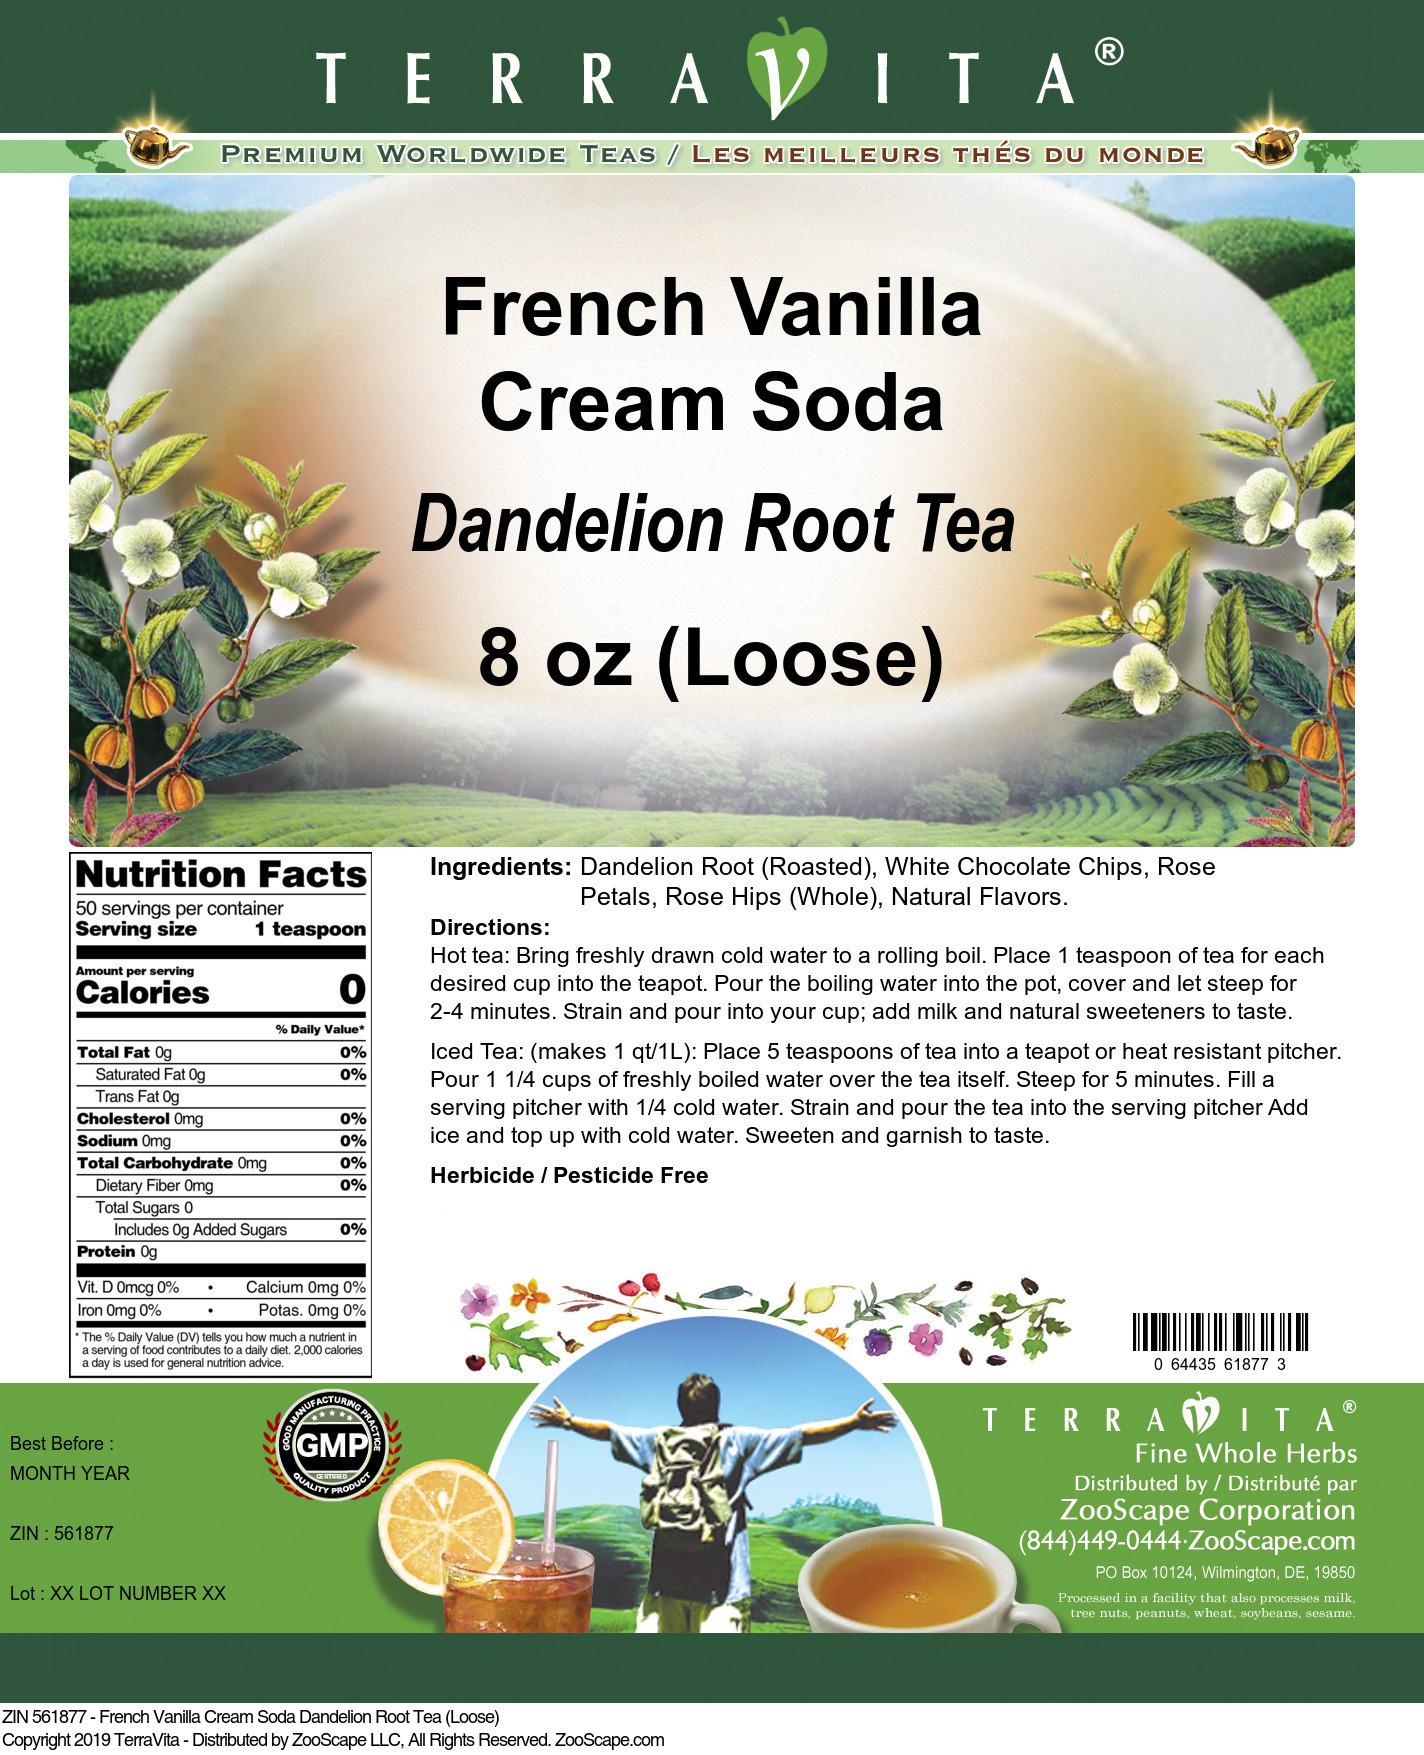 French Vanilla Cream Soda Dandelion Root Tea (Loose)